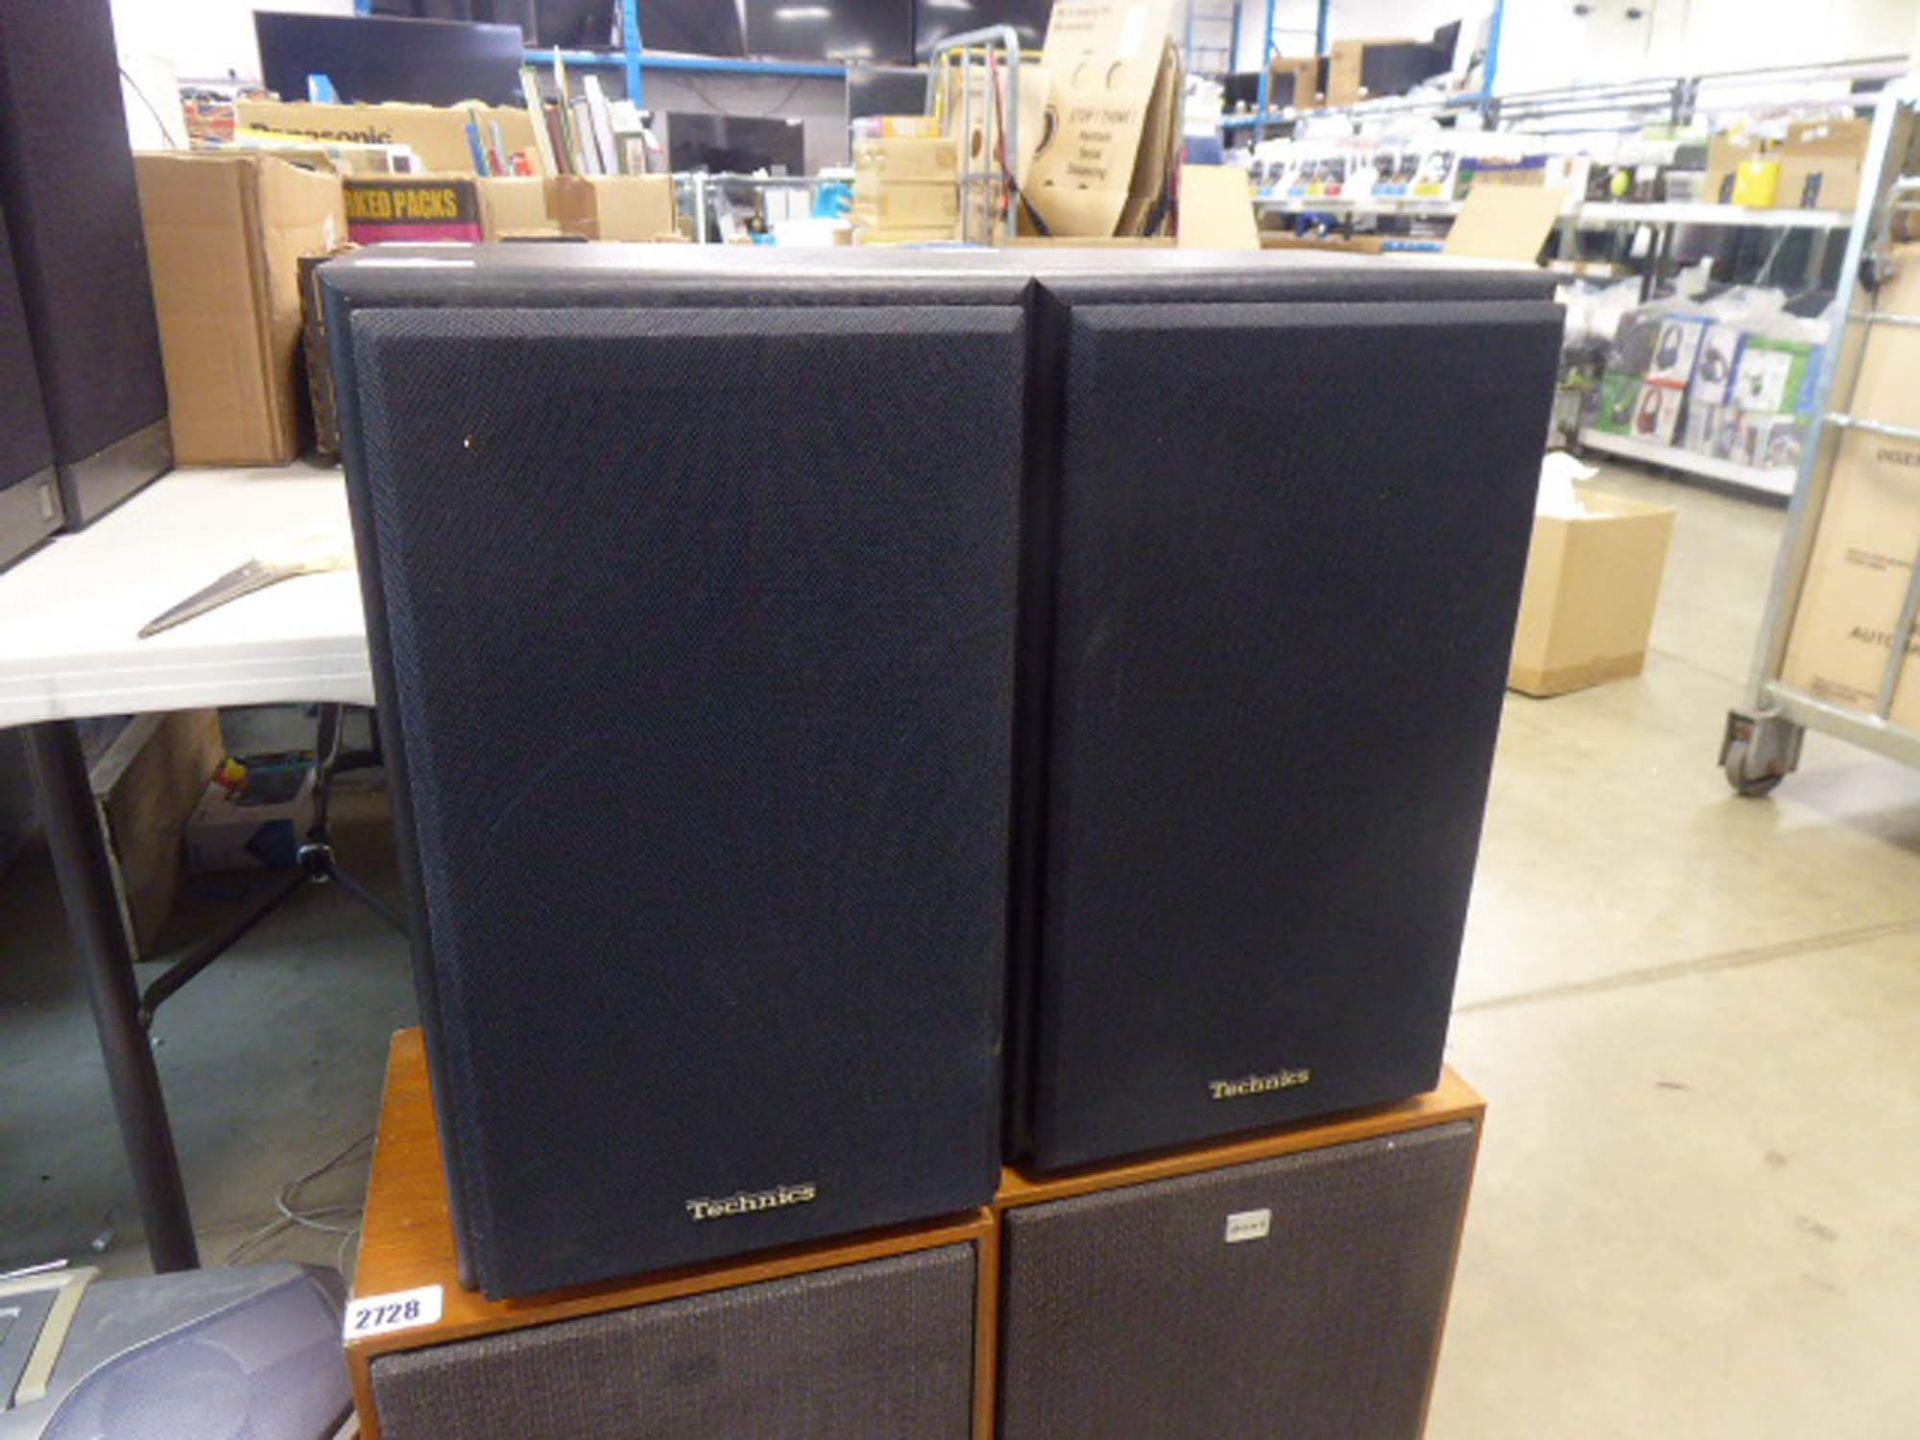 Pair of Technix Model SB-CS5 speakers with covers